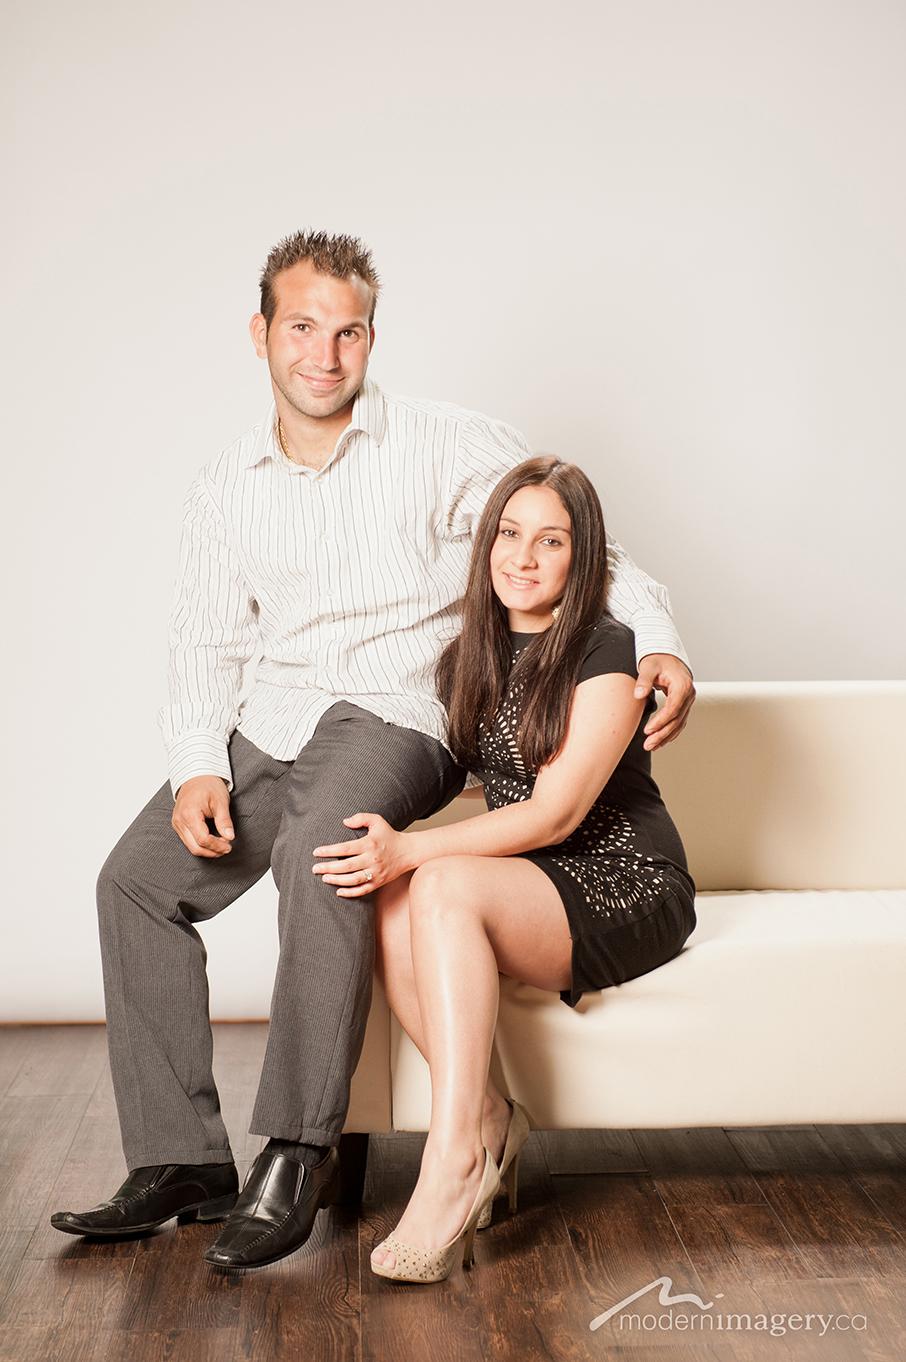 Rita&Tomasso-15.jpg